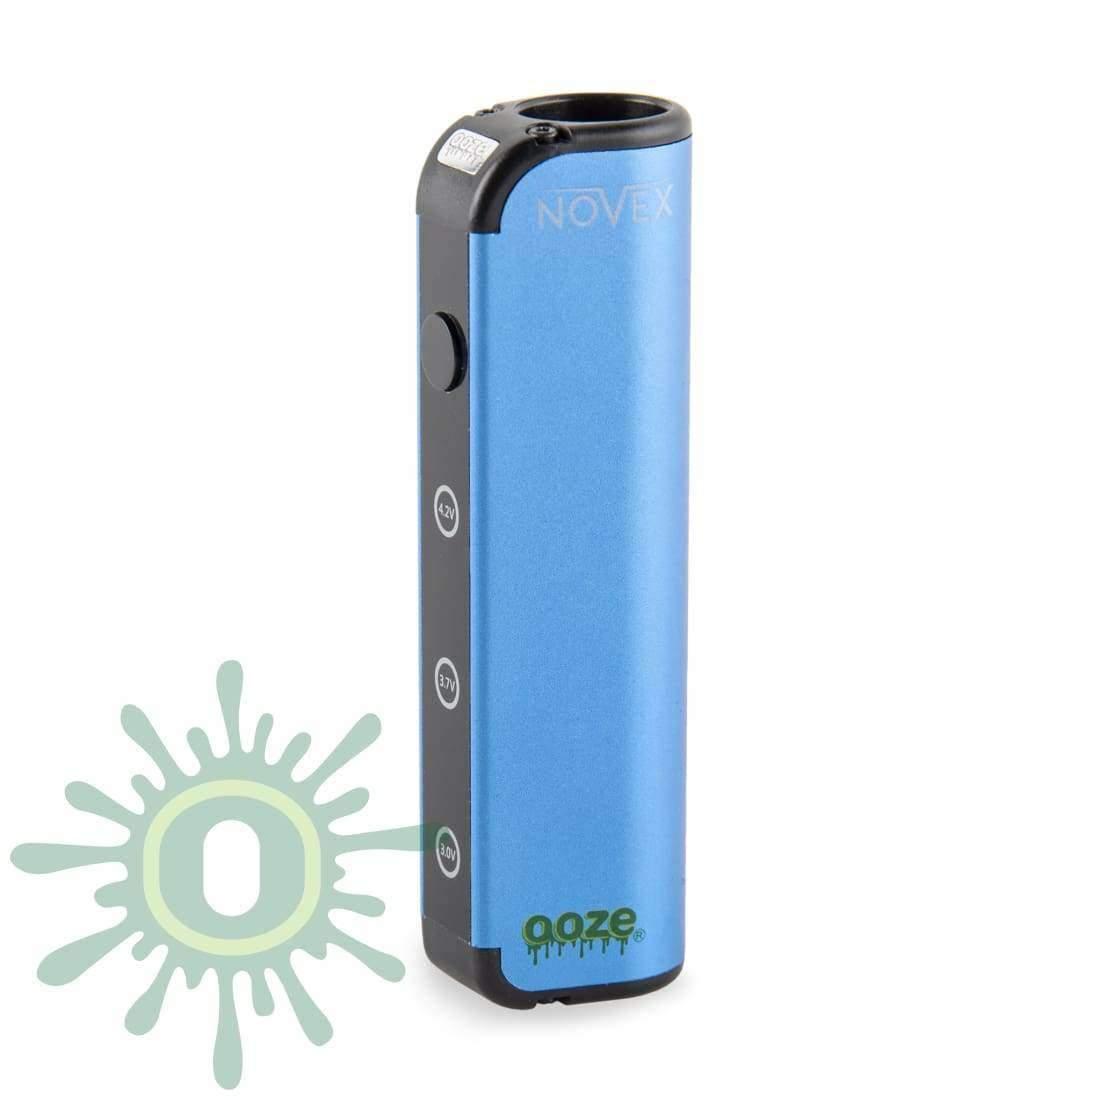 Ooze Novex Extract Vape Battery- Ocean Blue